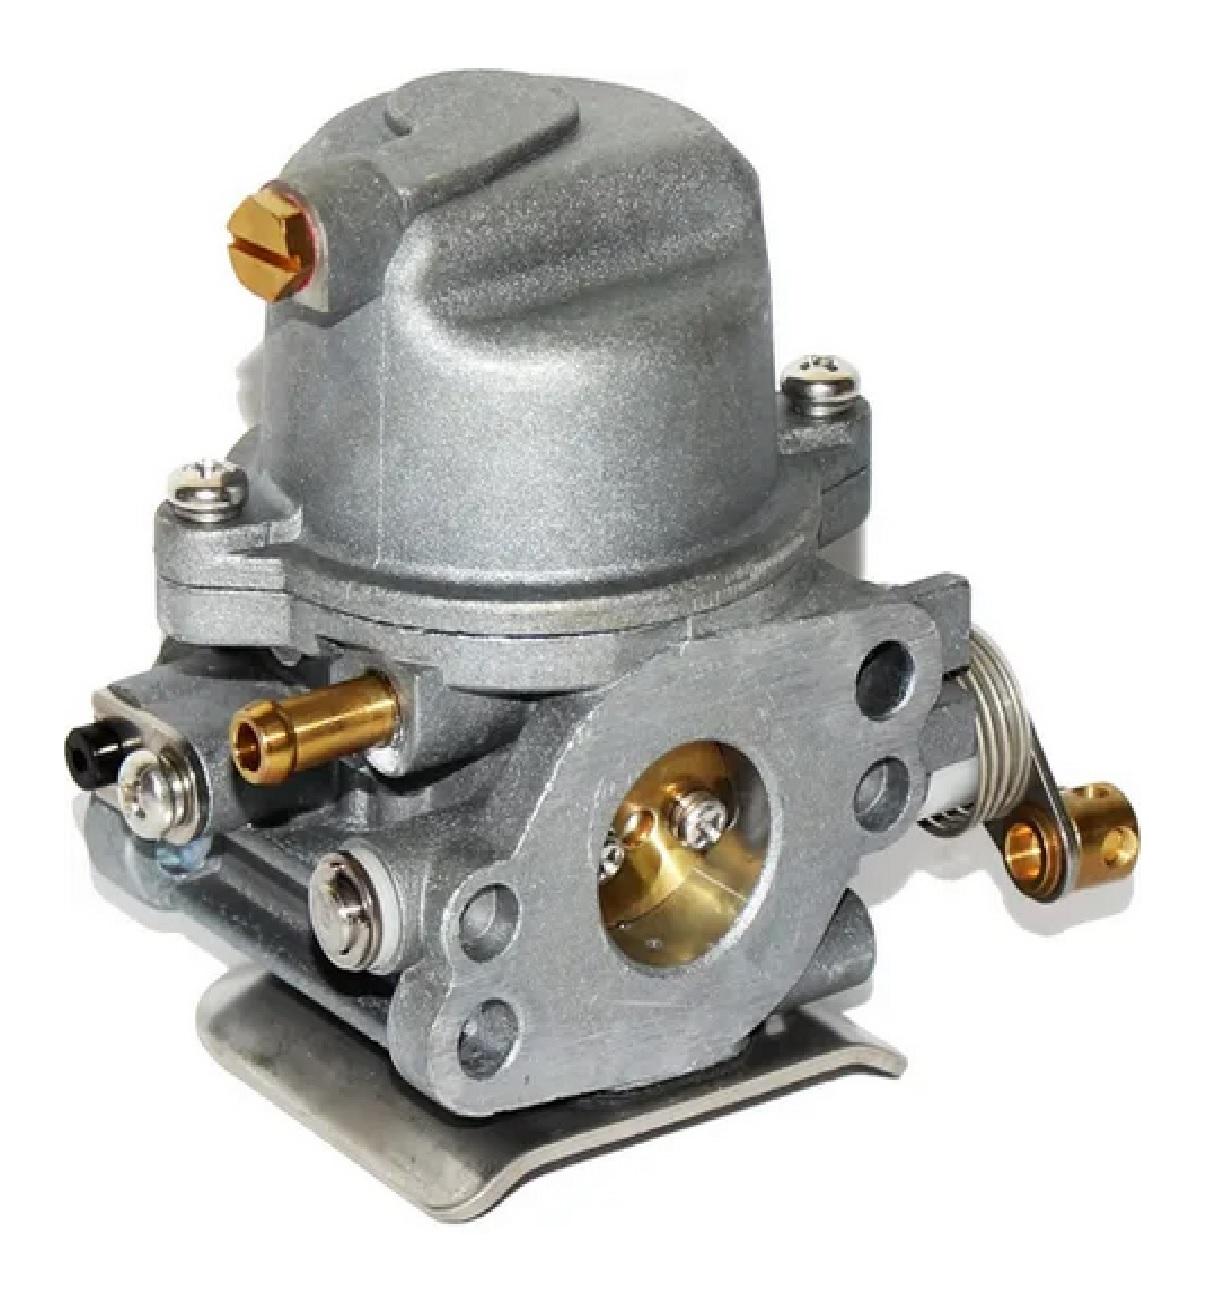 Carburador P/ Motor Branco E Pantaneiro Marine 4t-5